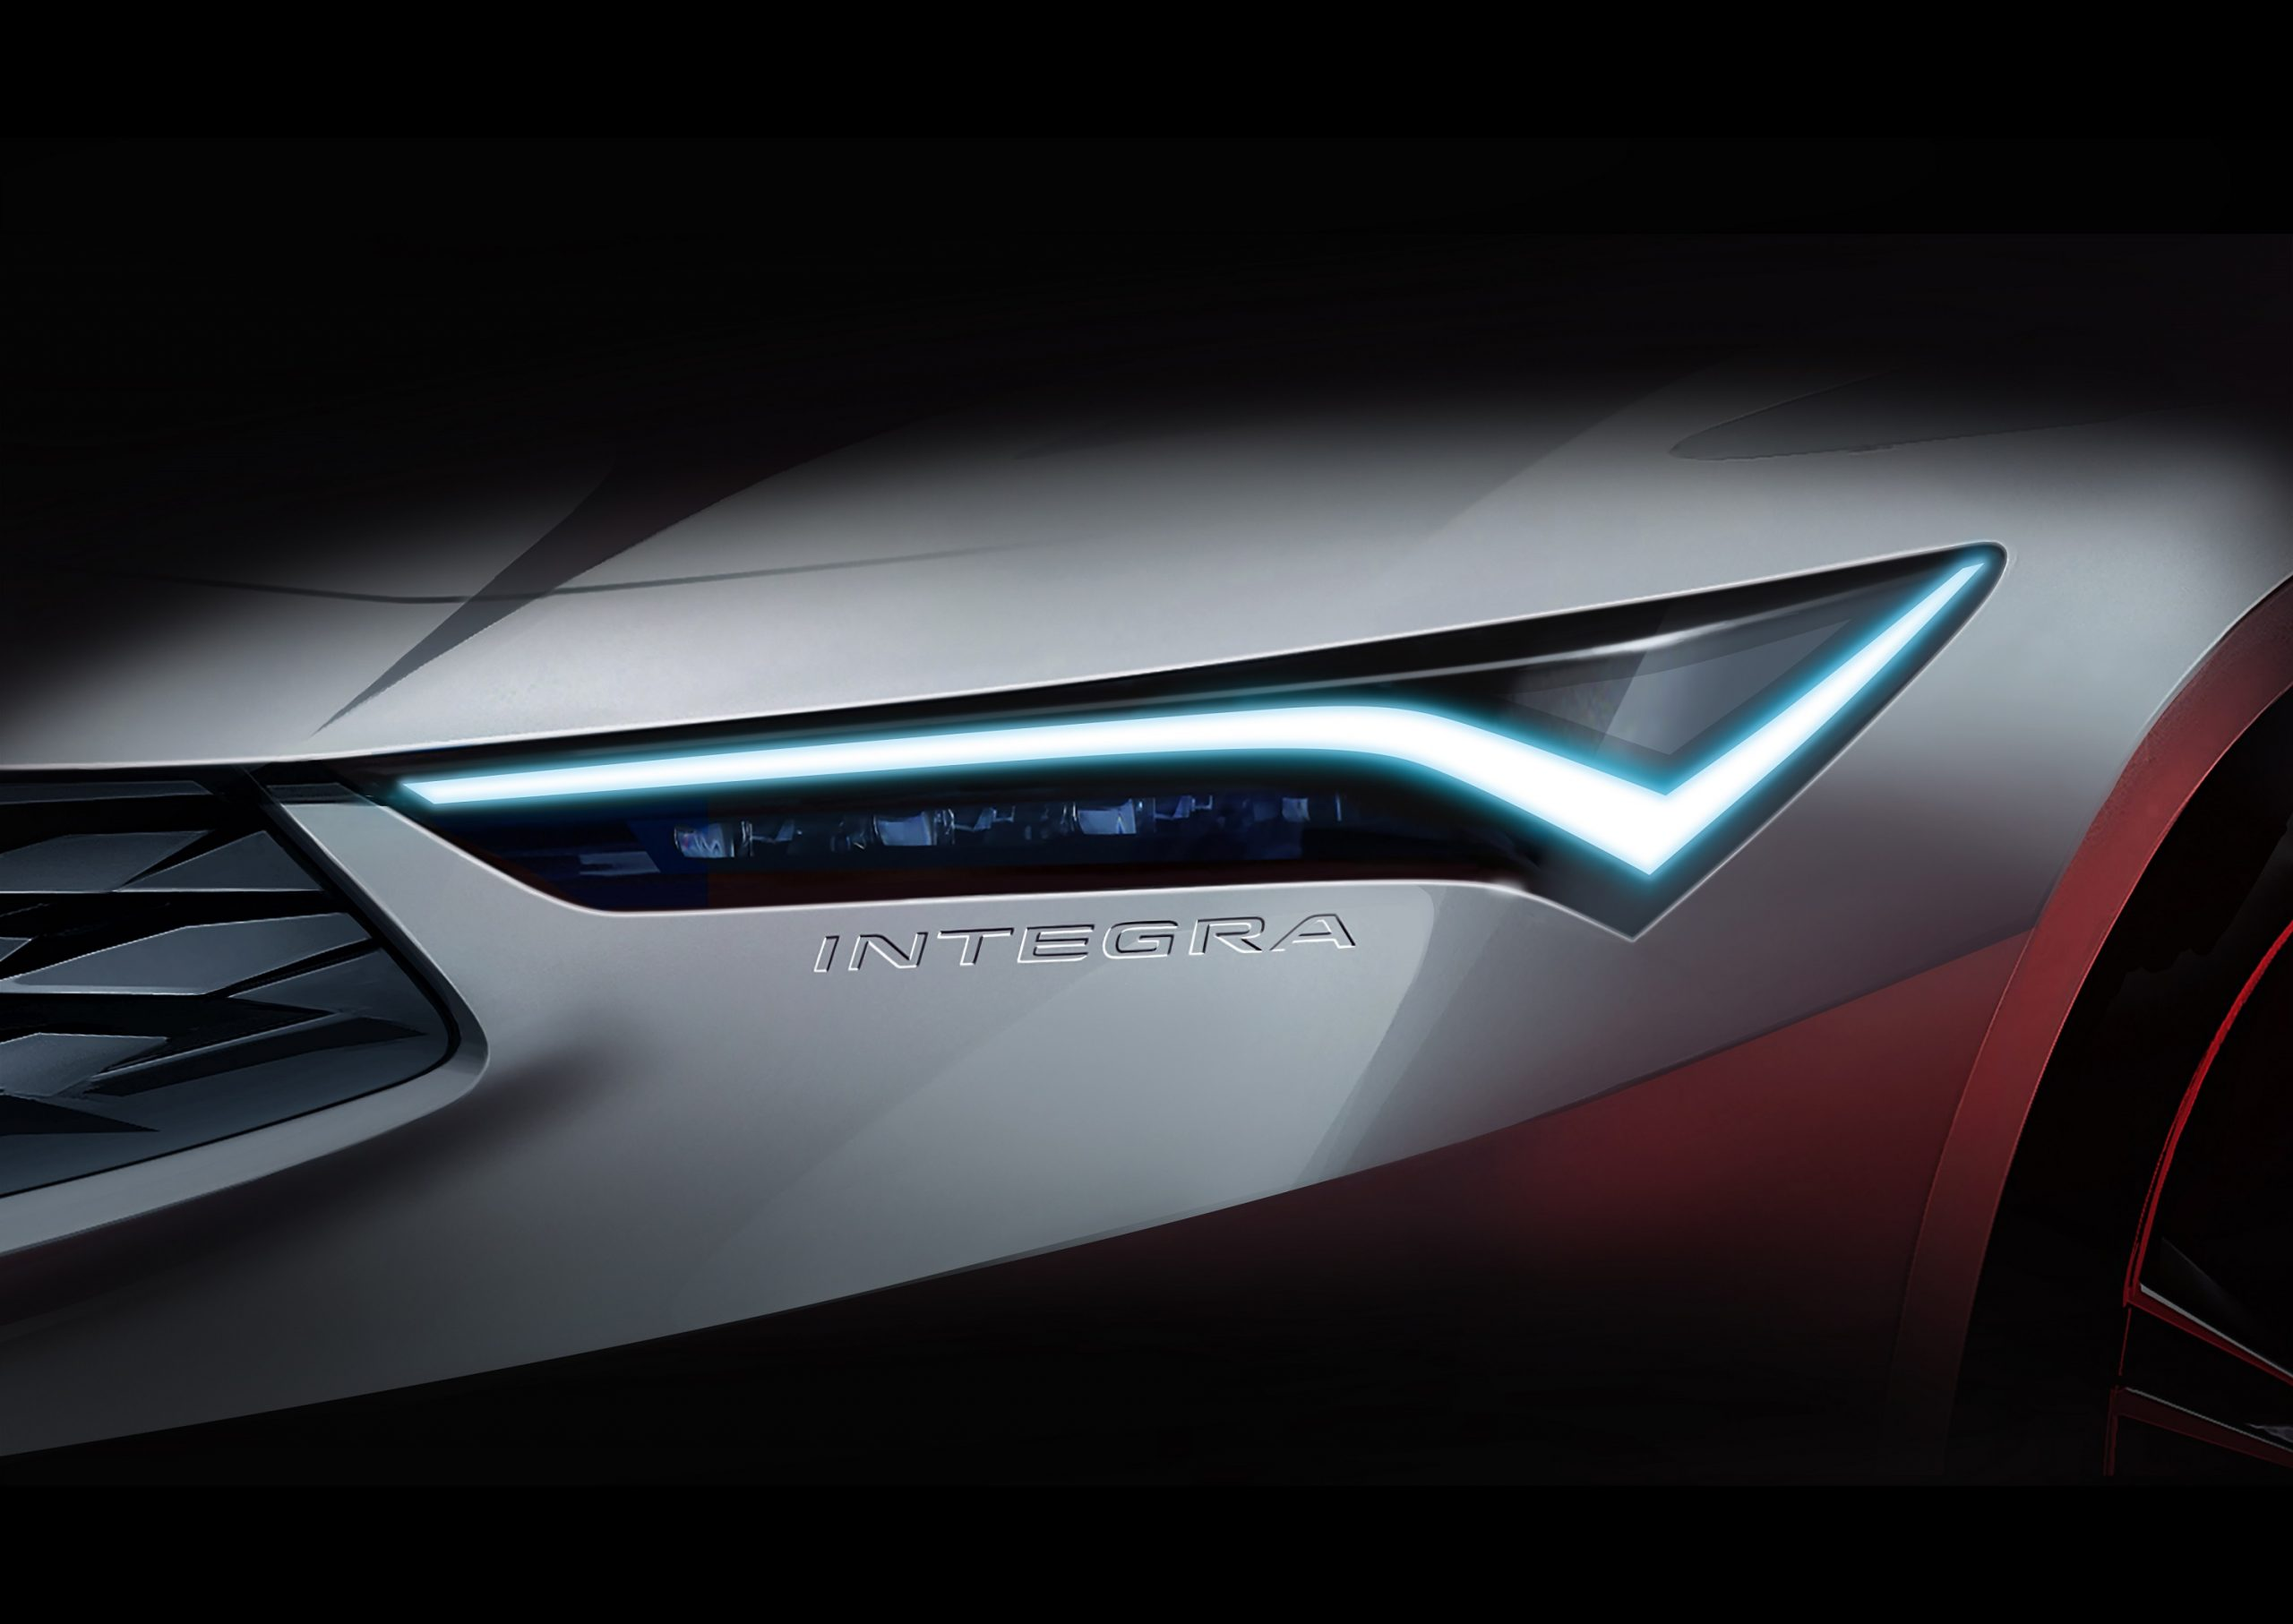 The headlight of the white 2022 Acura Integra